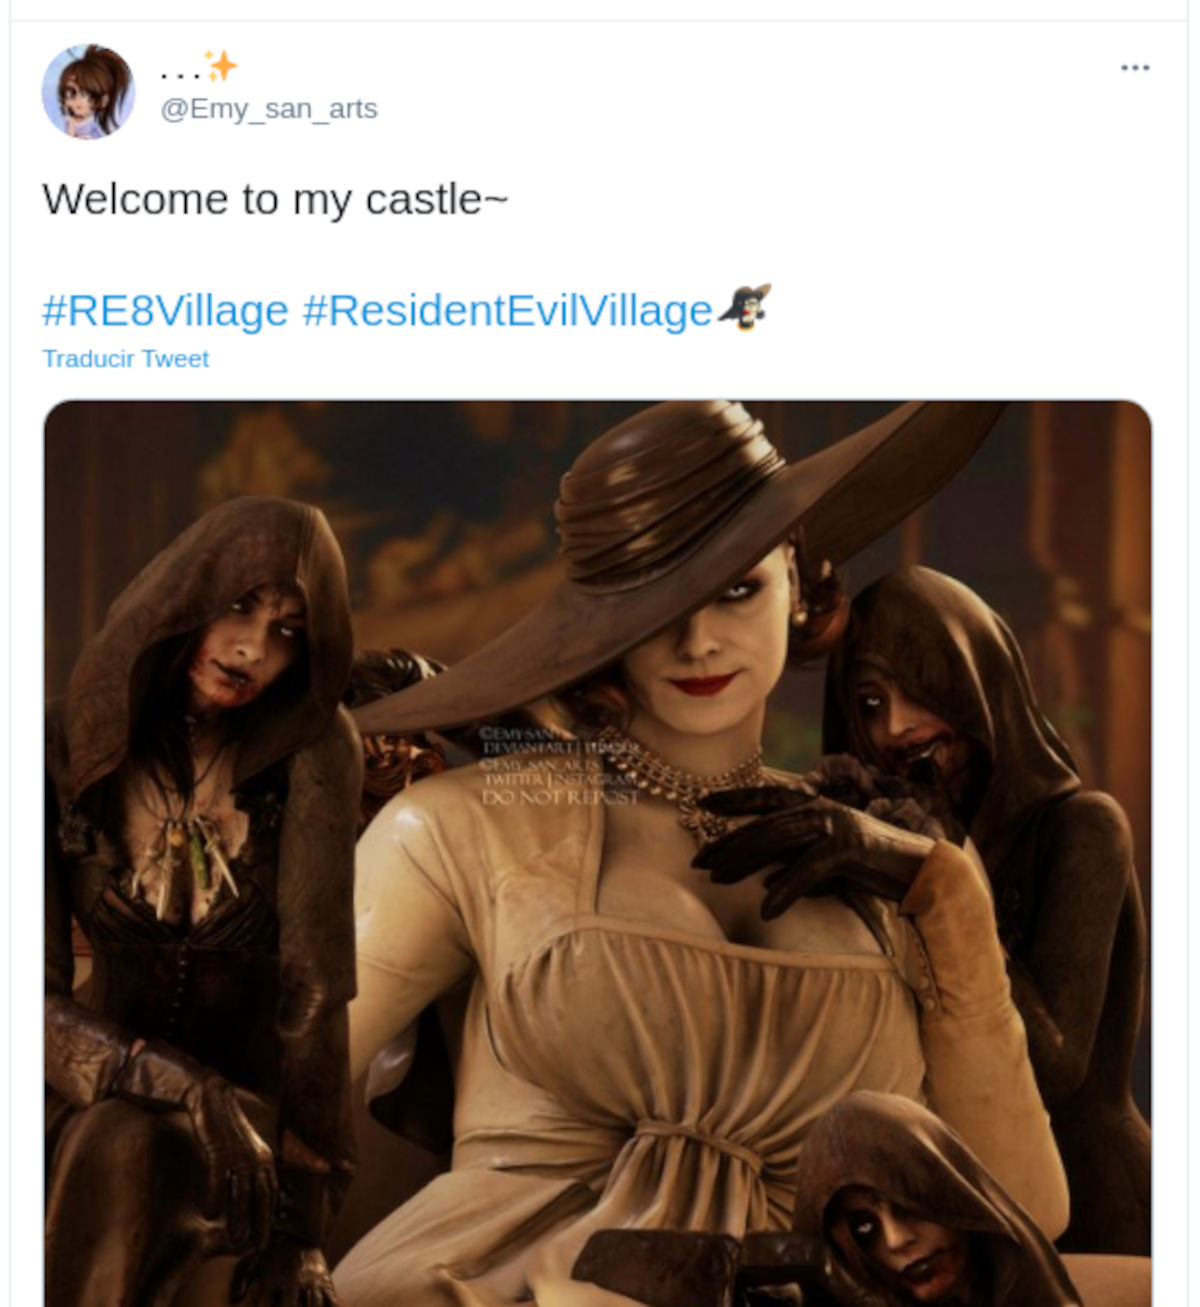 Lady Dimitrescu de Resident Evil: Village invade Twitter